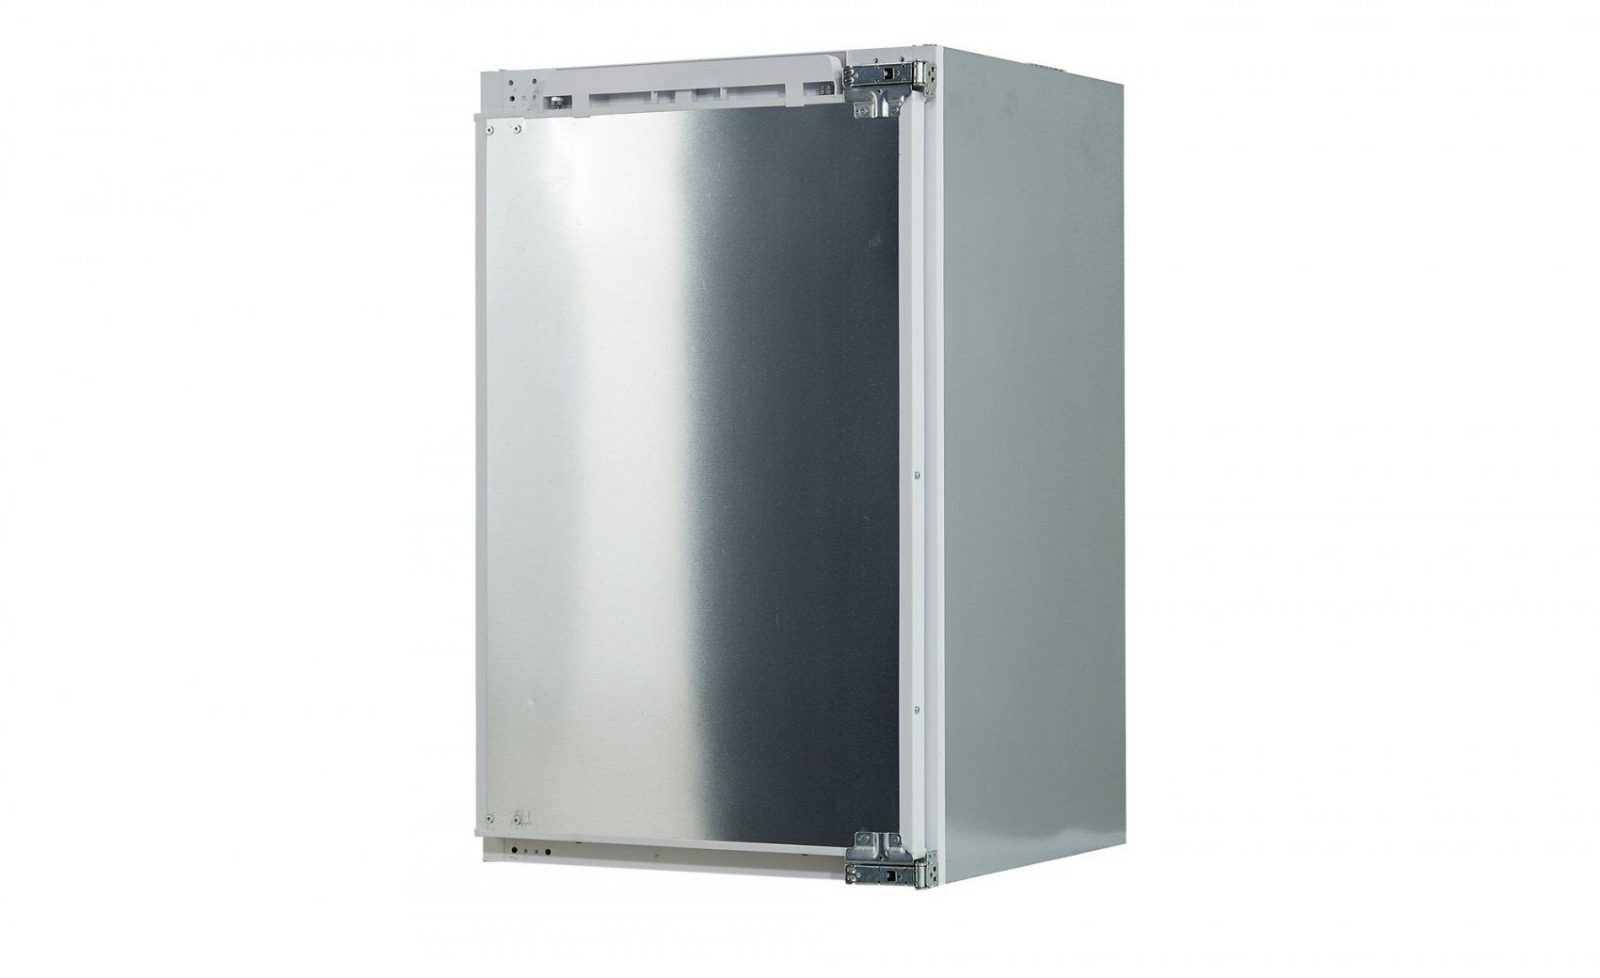 Siemens Einbaukühlschrank Ki 22 Lad 40 Bei Möbel Kraft